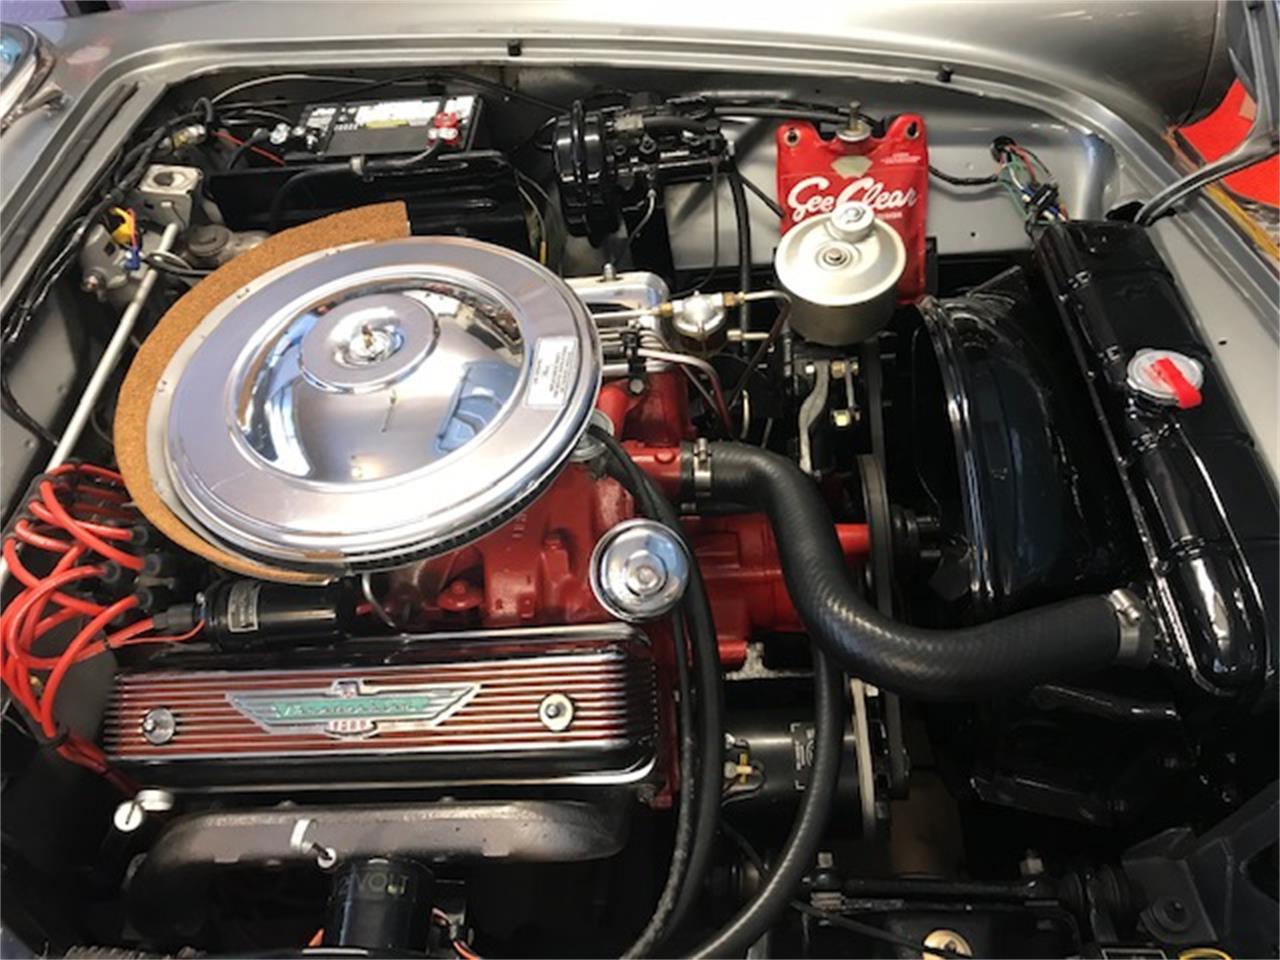 1957 Ford Thunderbird for Sale | ClassicCars.com